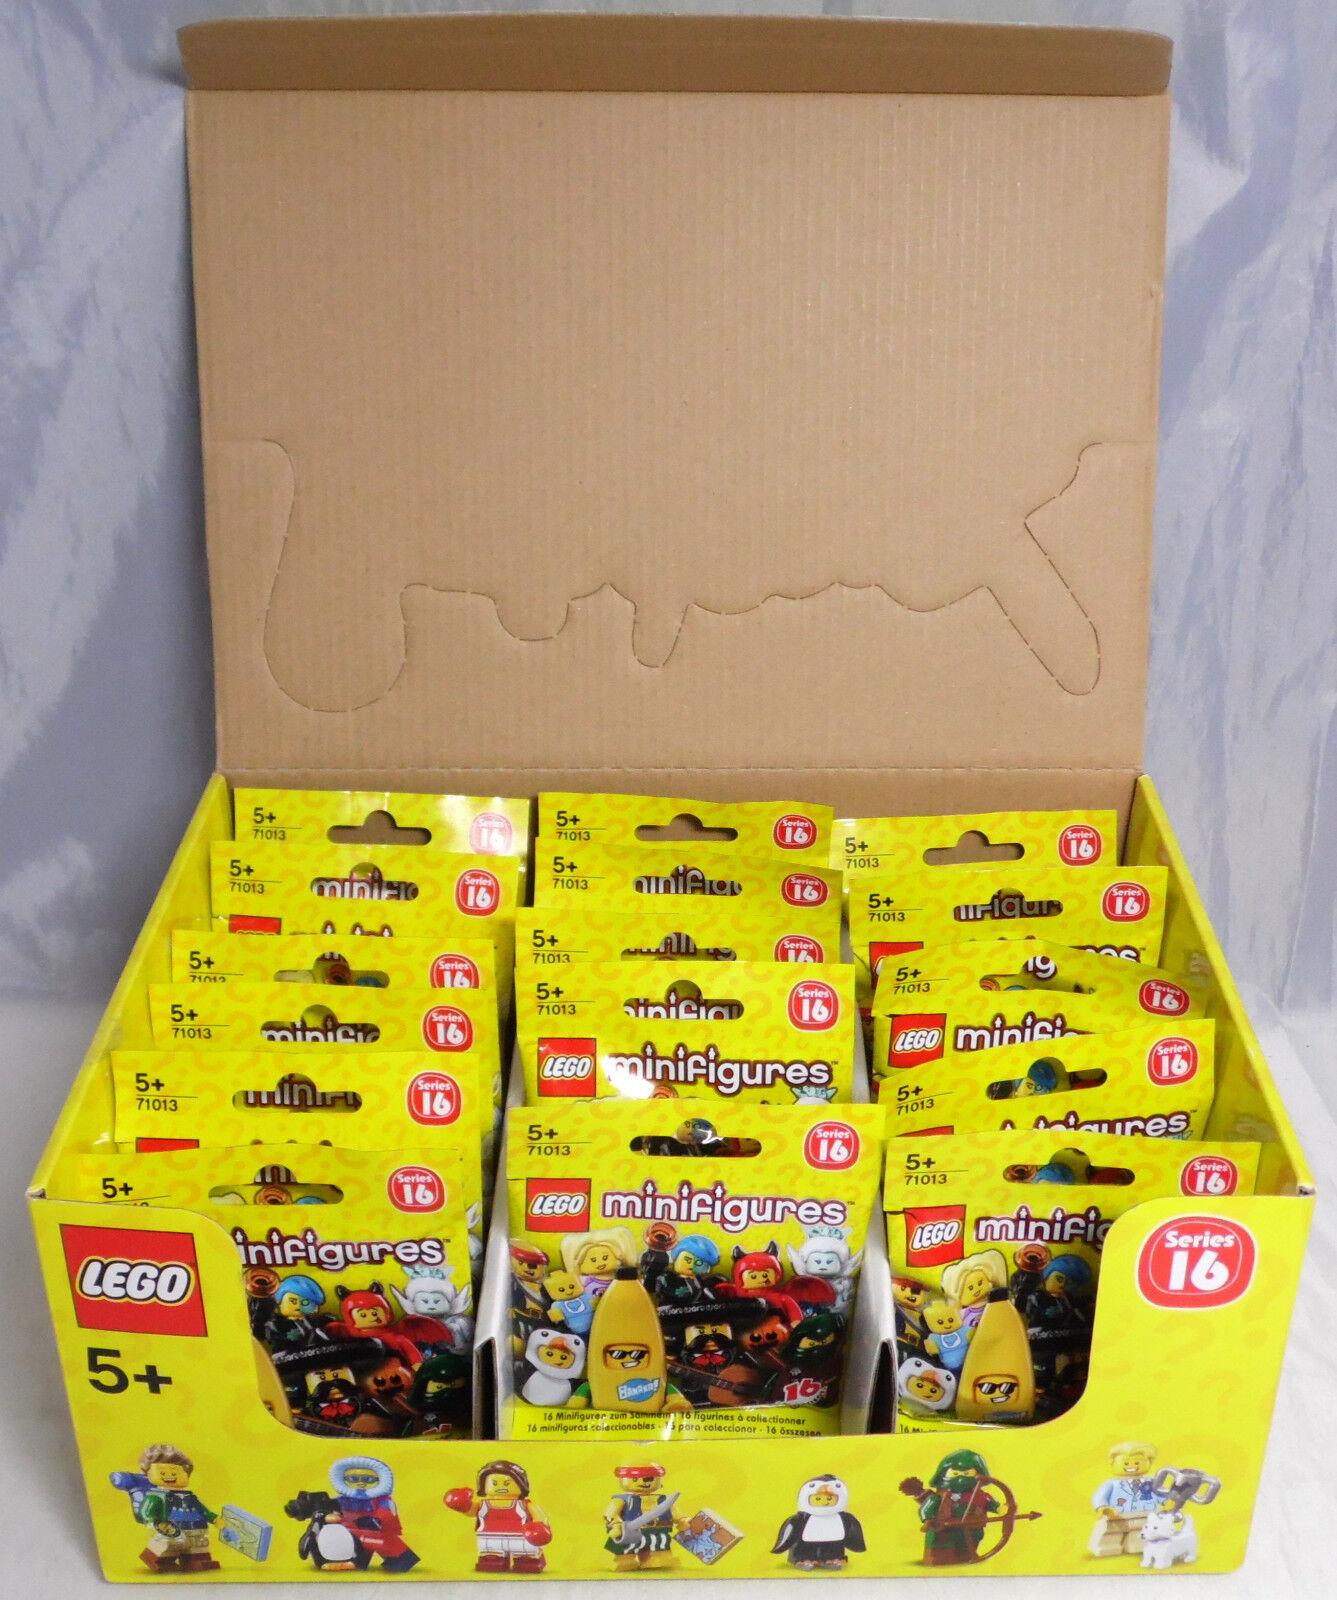 LEGO 71013 Minifiguren Serie 16, 1 kompletter Satz = 16 Figuren im Display NEU